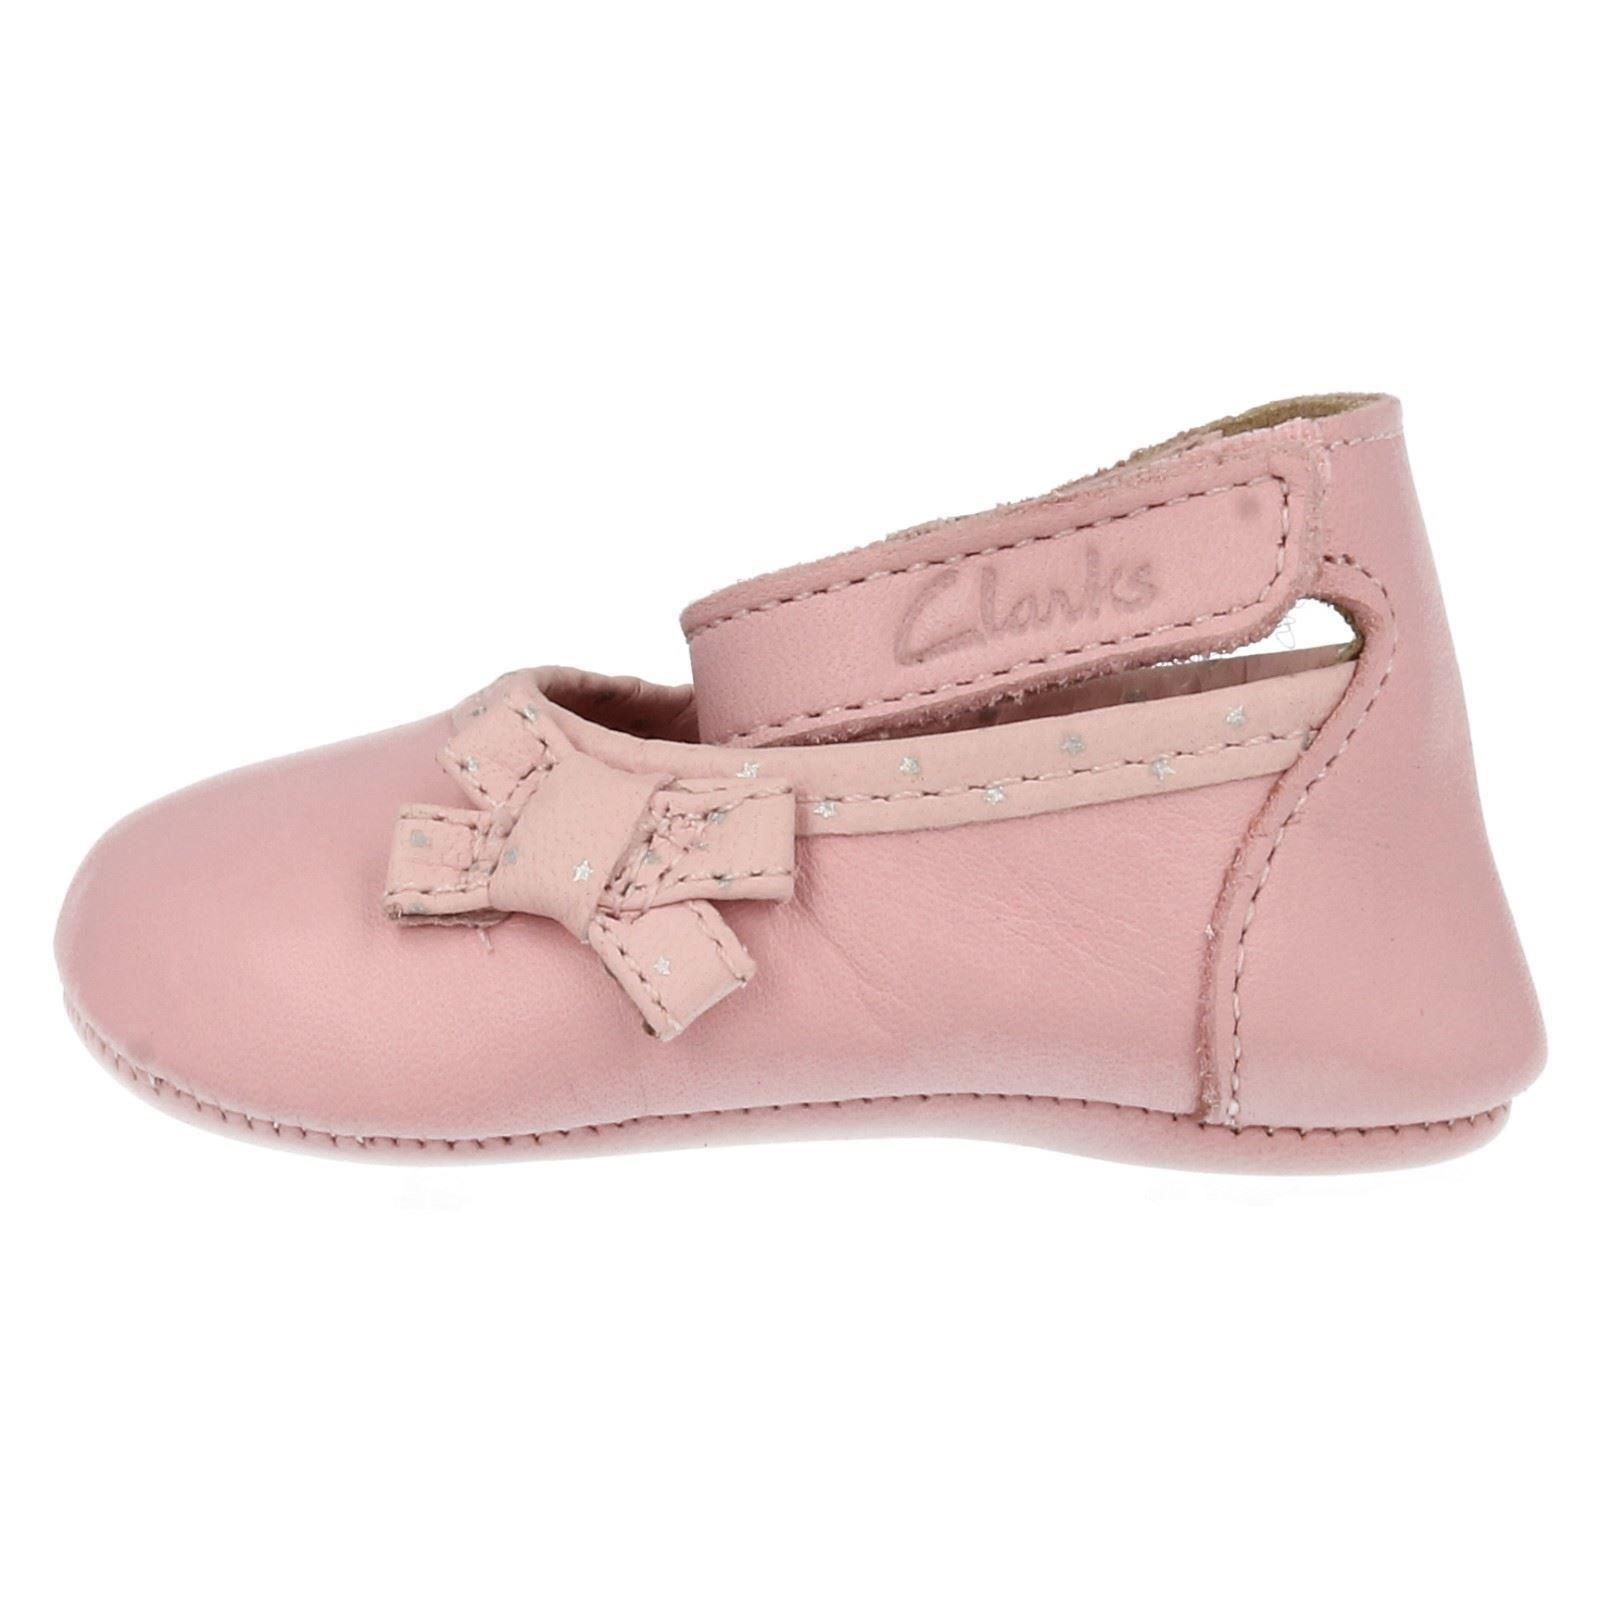 Clarks Girls Baby Shoes Harper